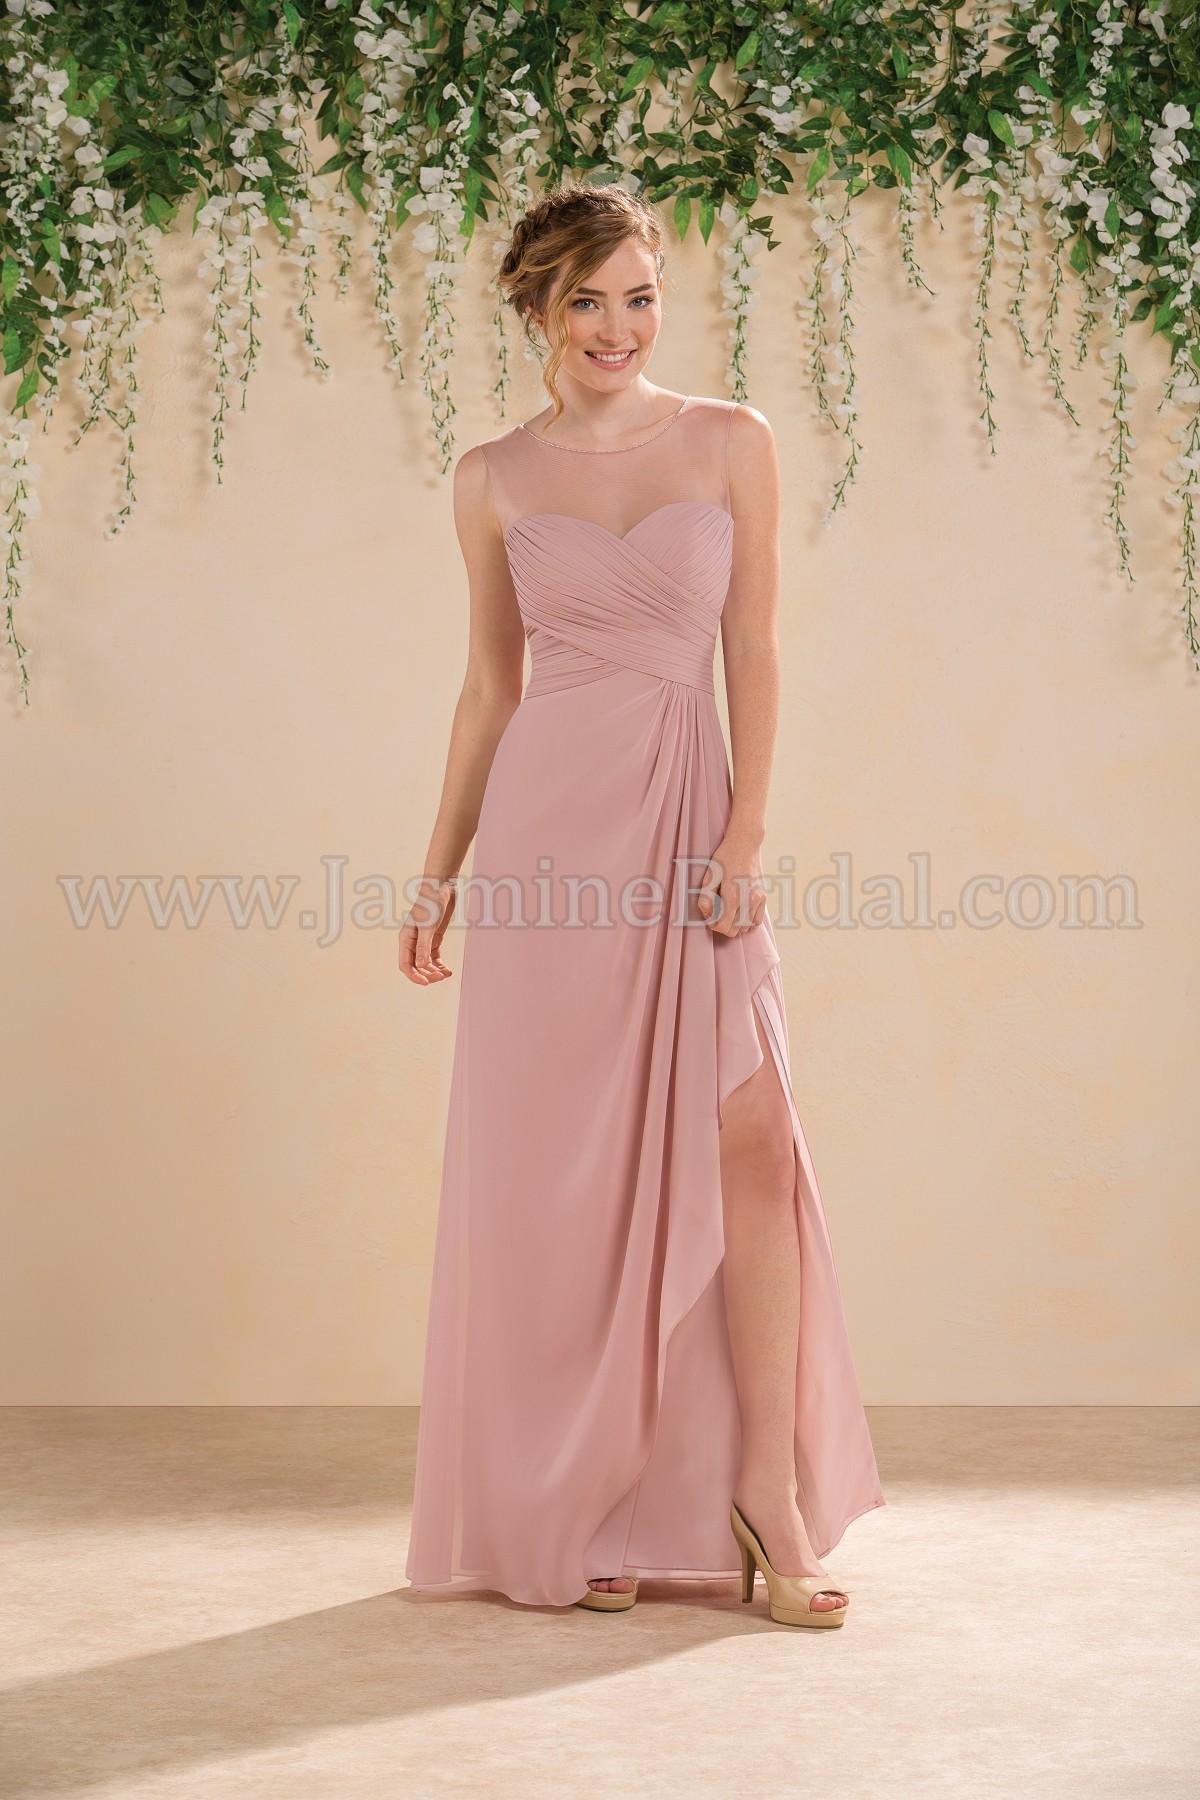 9748de1f65434 B183013 Long Sweetheart Illusion Neckline Poly Chiffon Bridesmaid Dress  with Slit